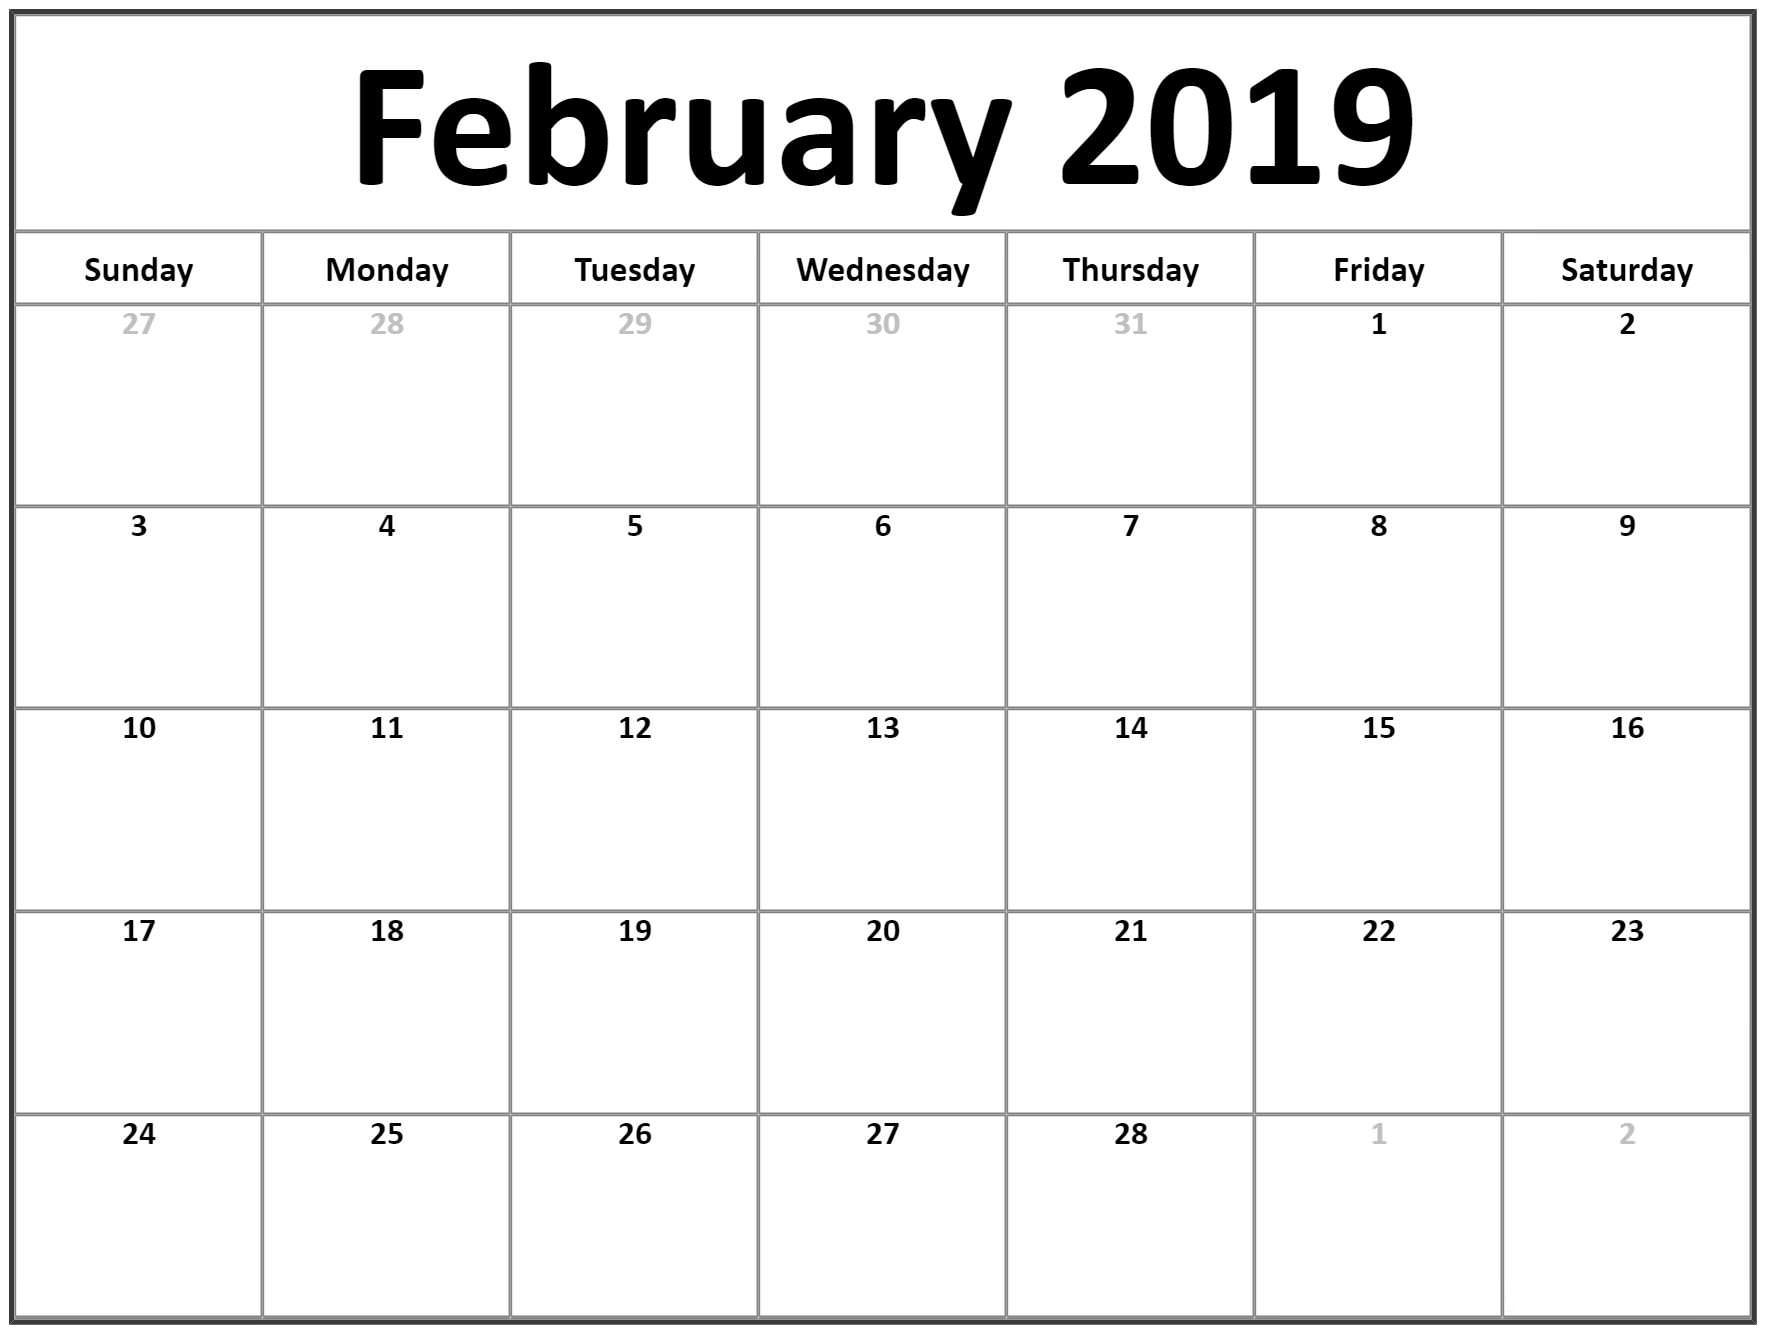 february 2019 landscape portrait template blank::February 2019 Calendar Template